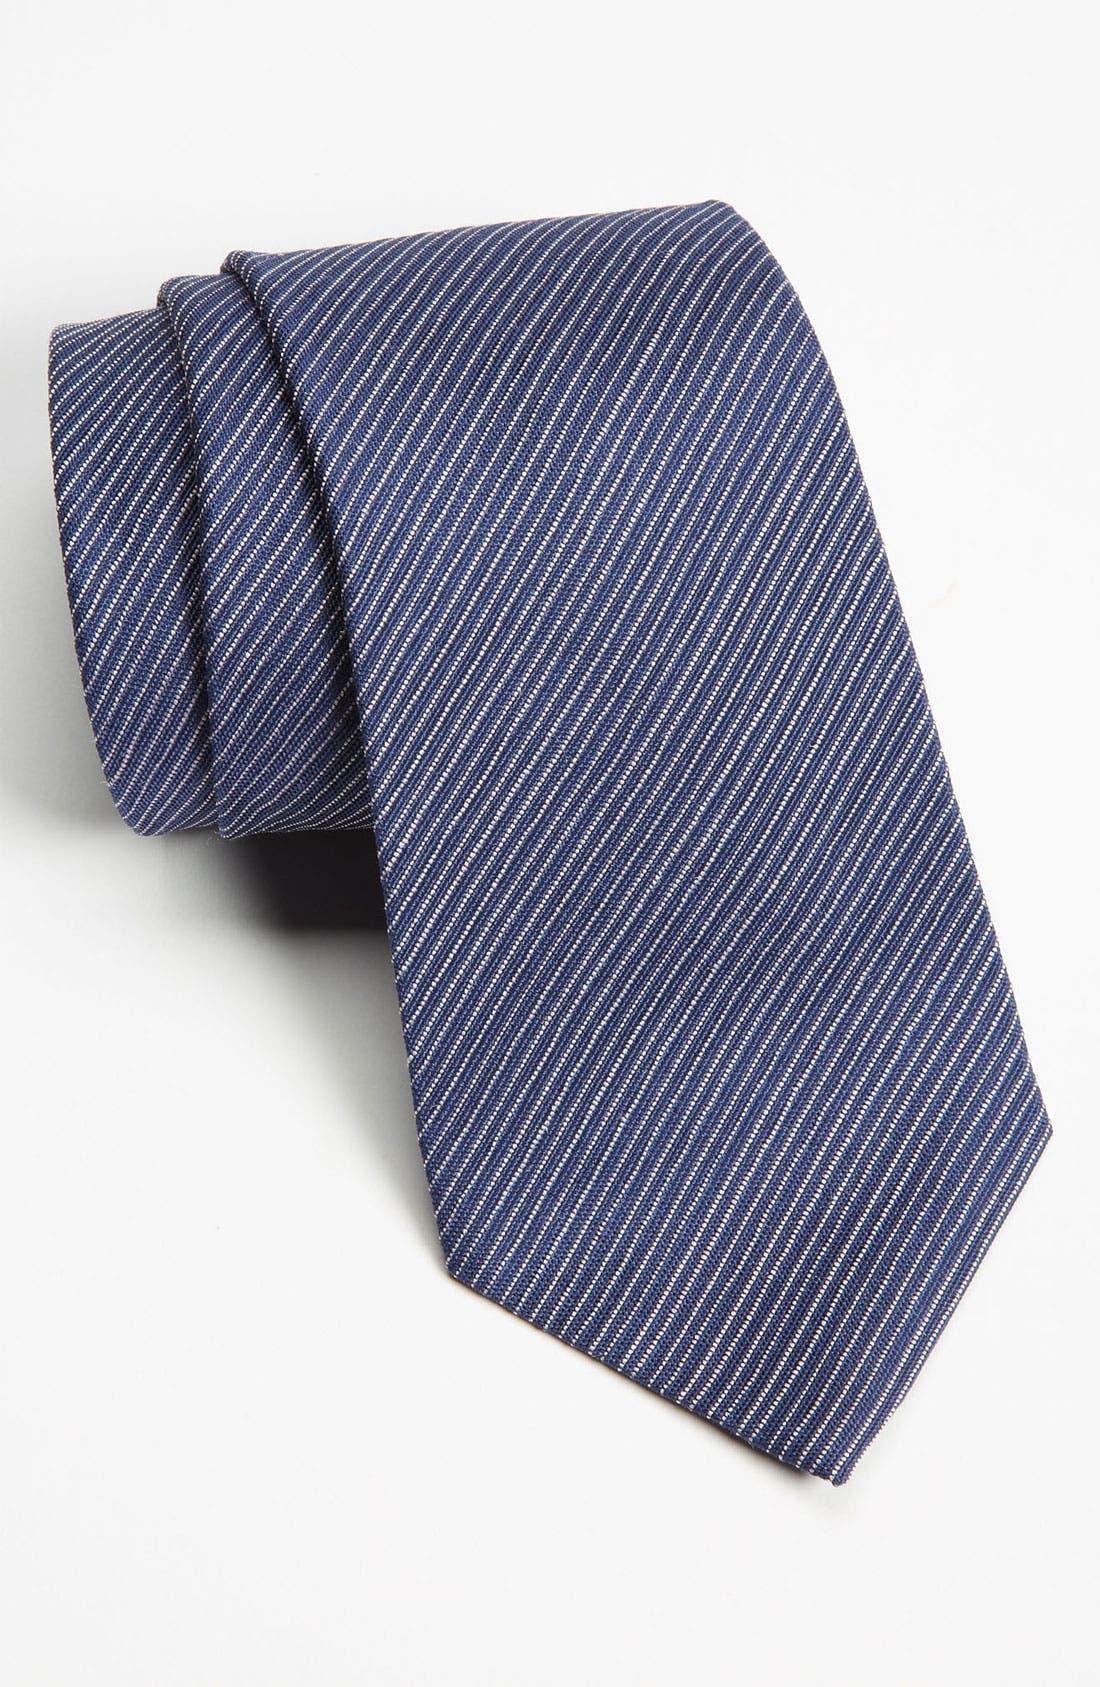 Main Image - Z Zegna Stripe Woven Silk Tie